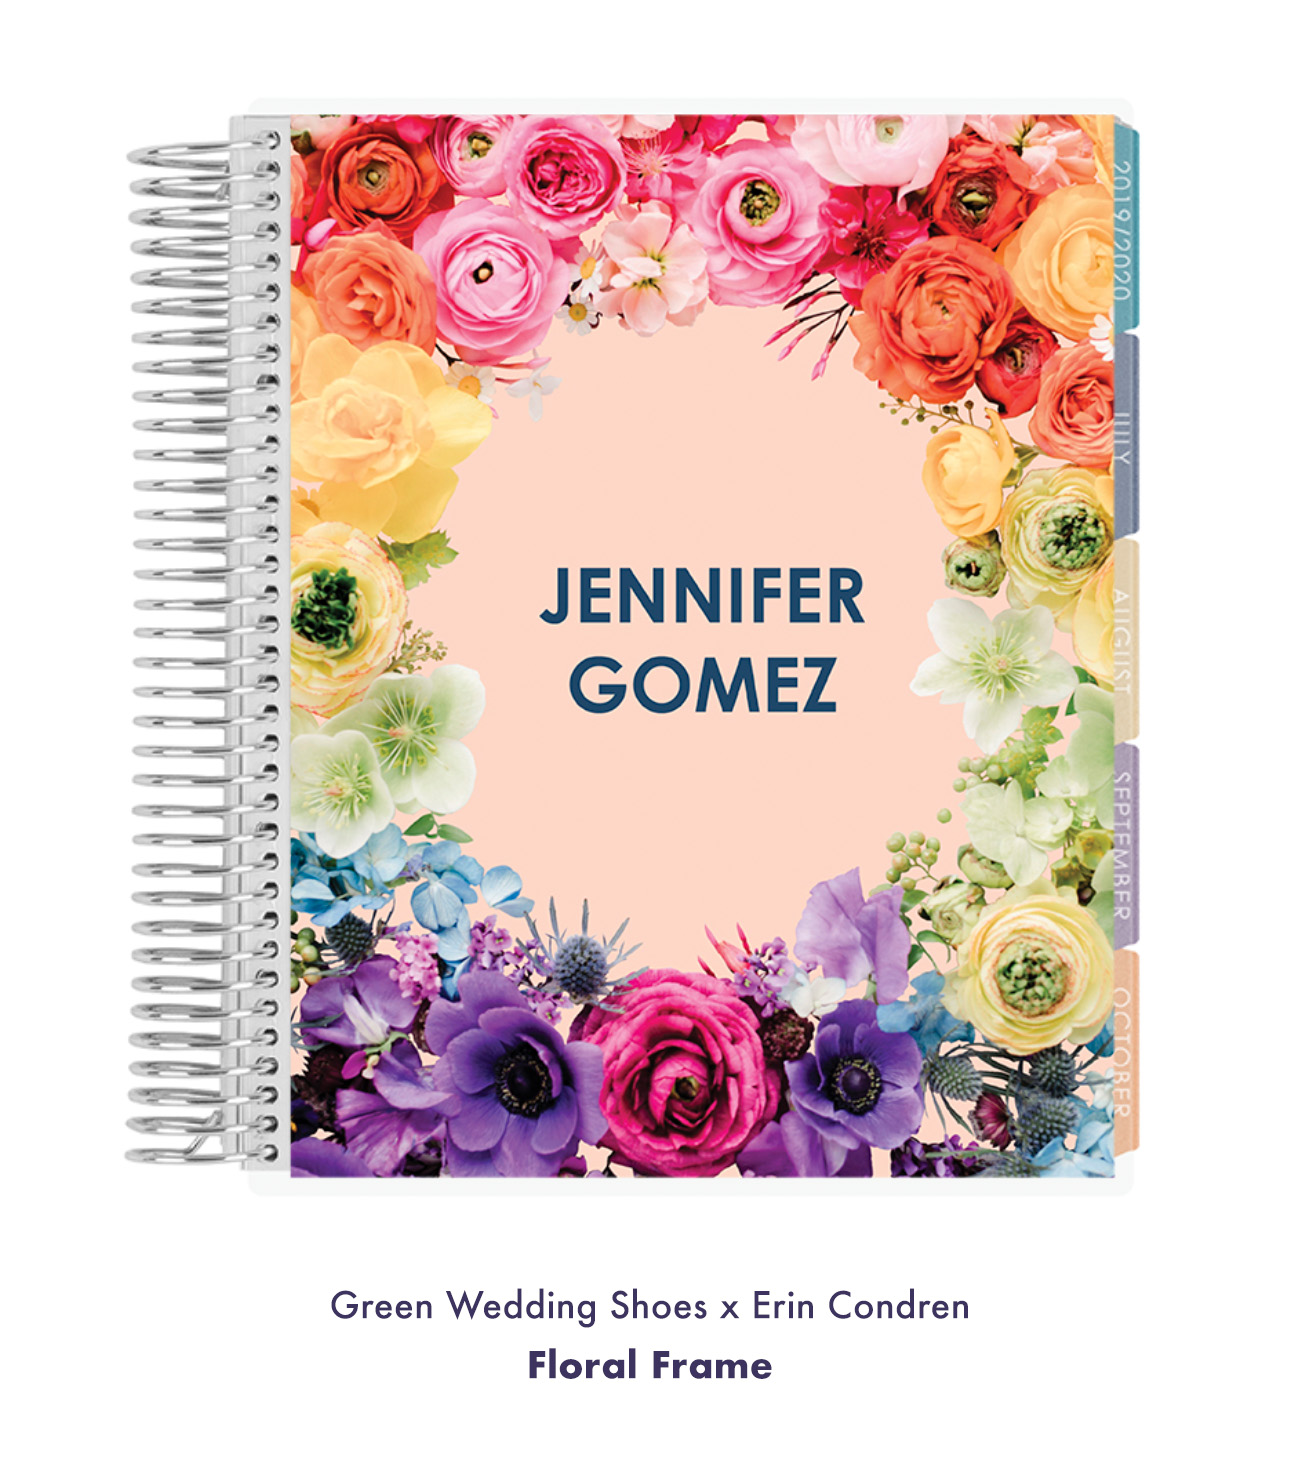 Green Wedding Shoes x Erin Condren Floral Frame Design